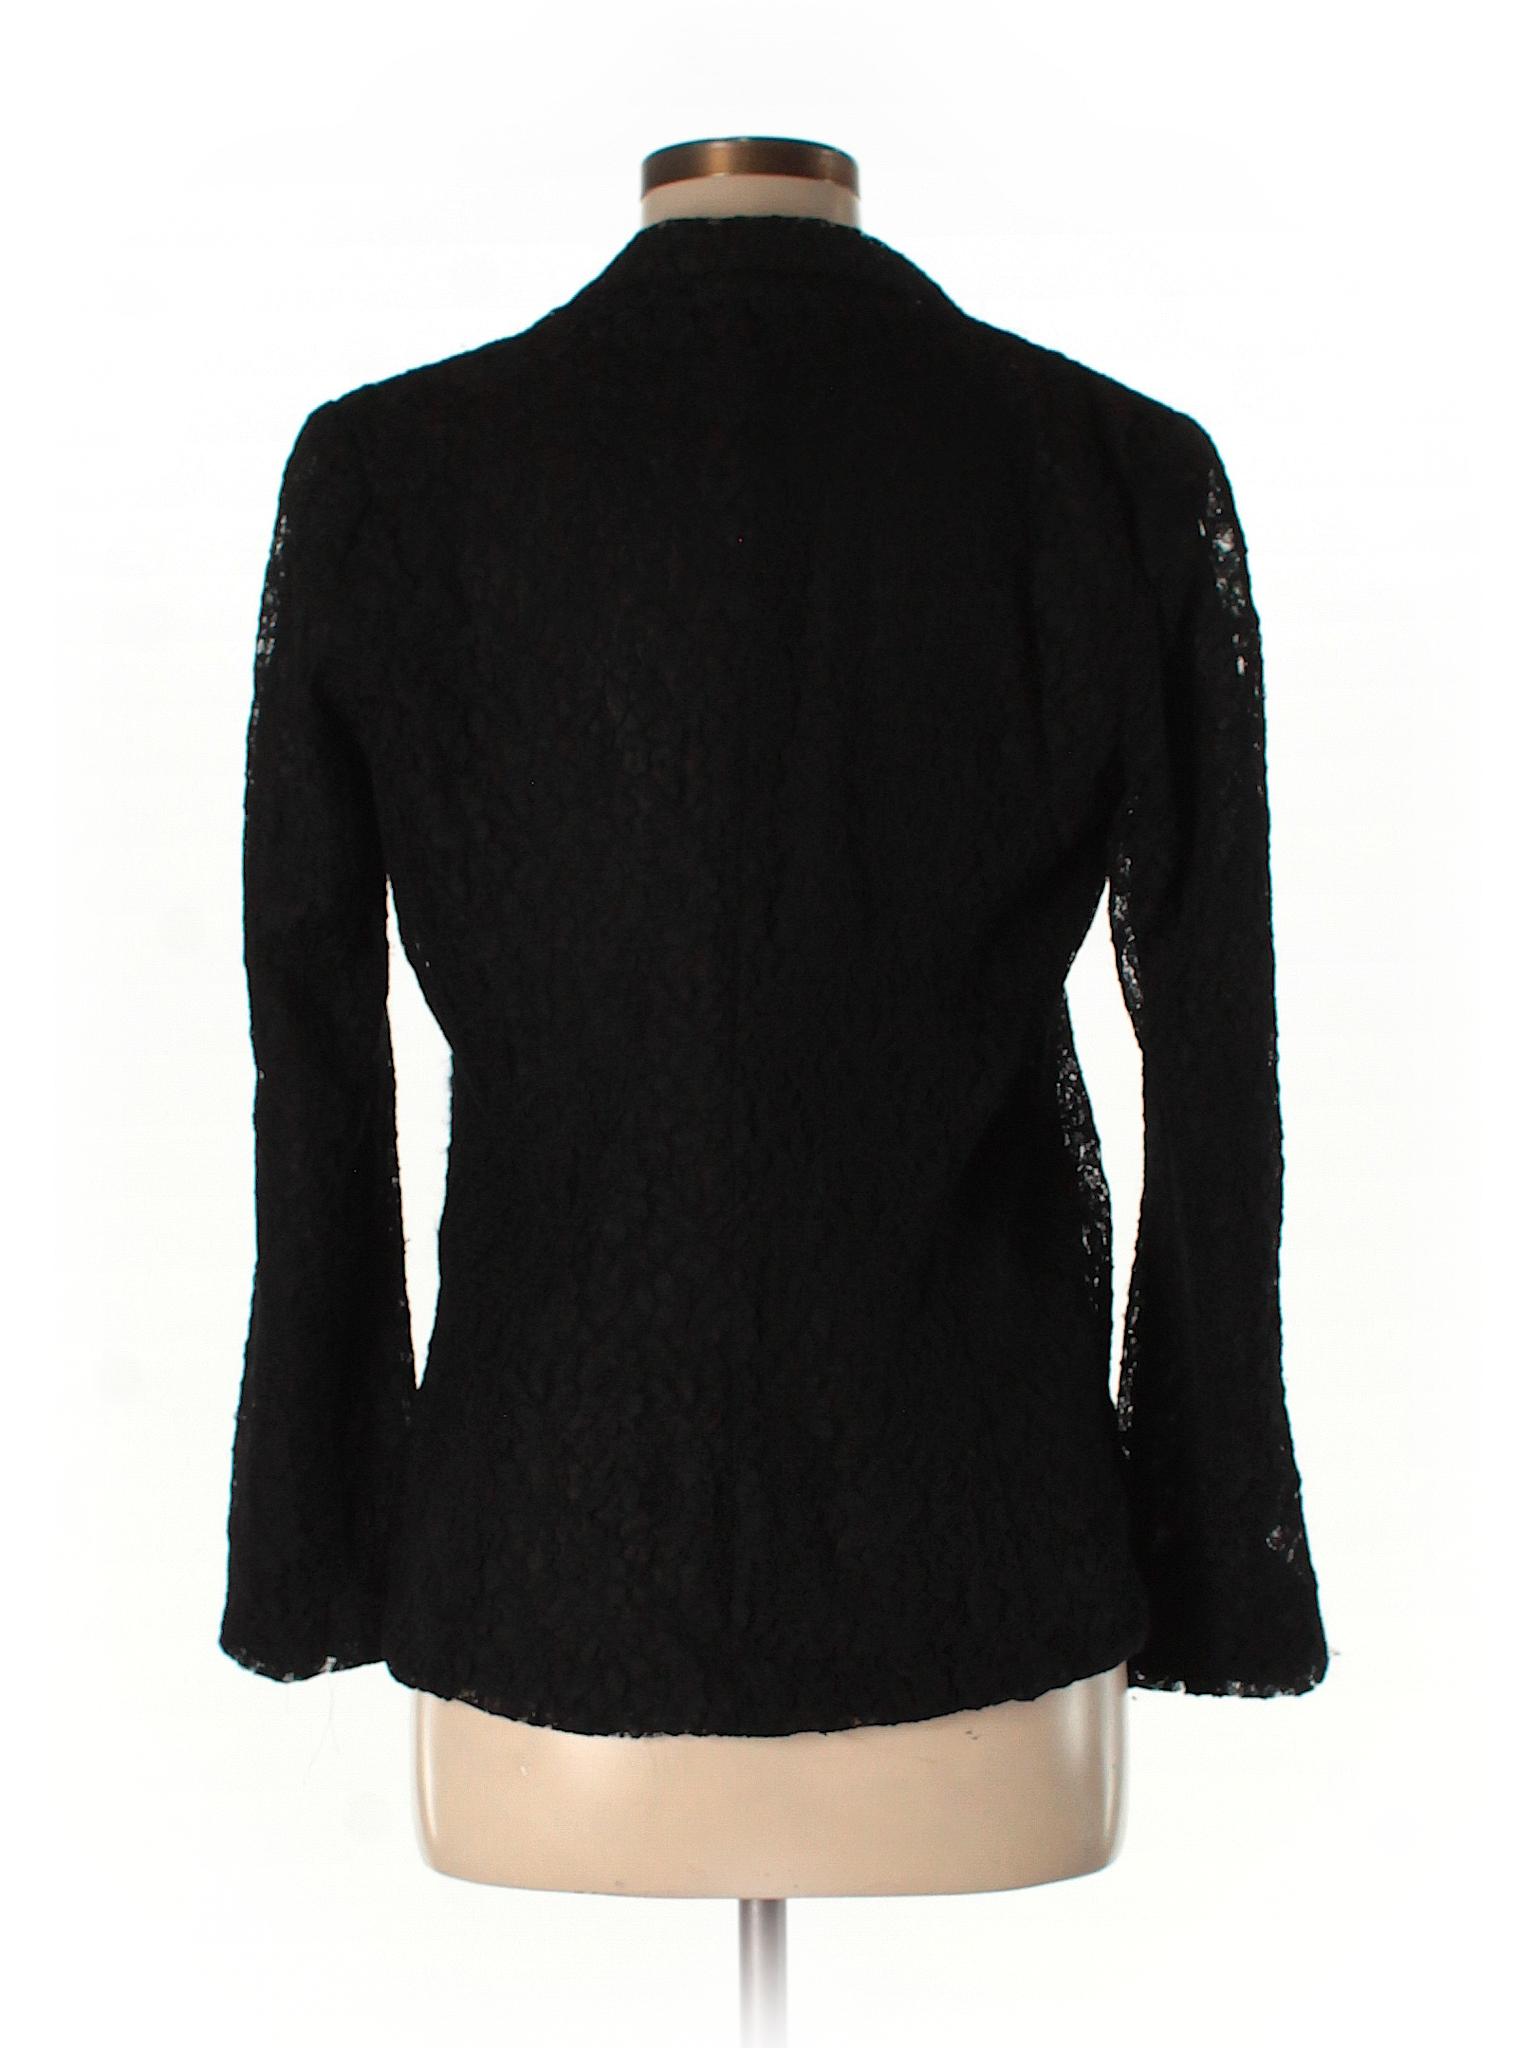 Boutique Blazer Conrad LC winter Lauren ryIY7rq